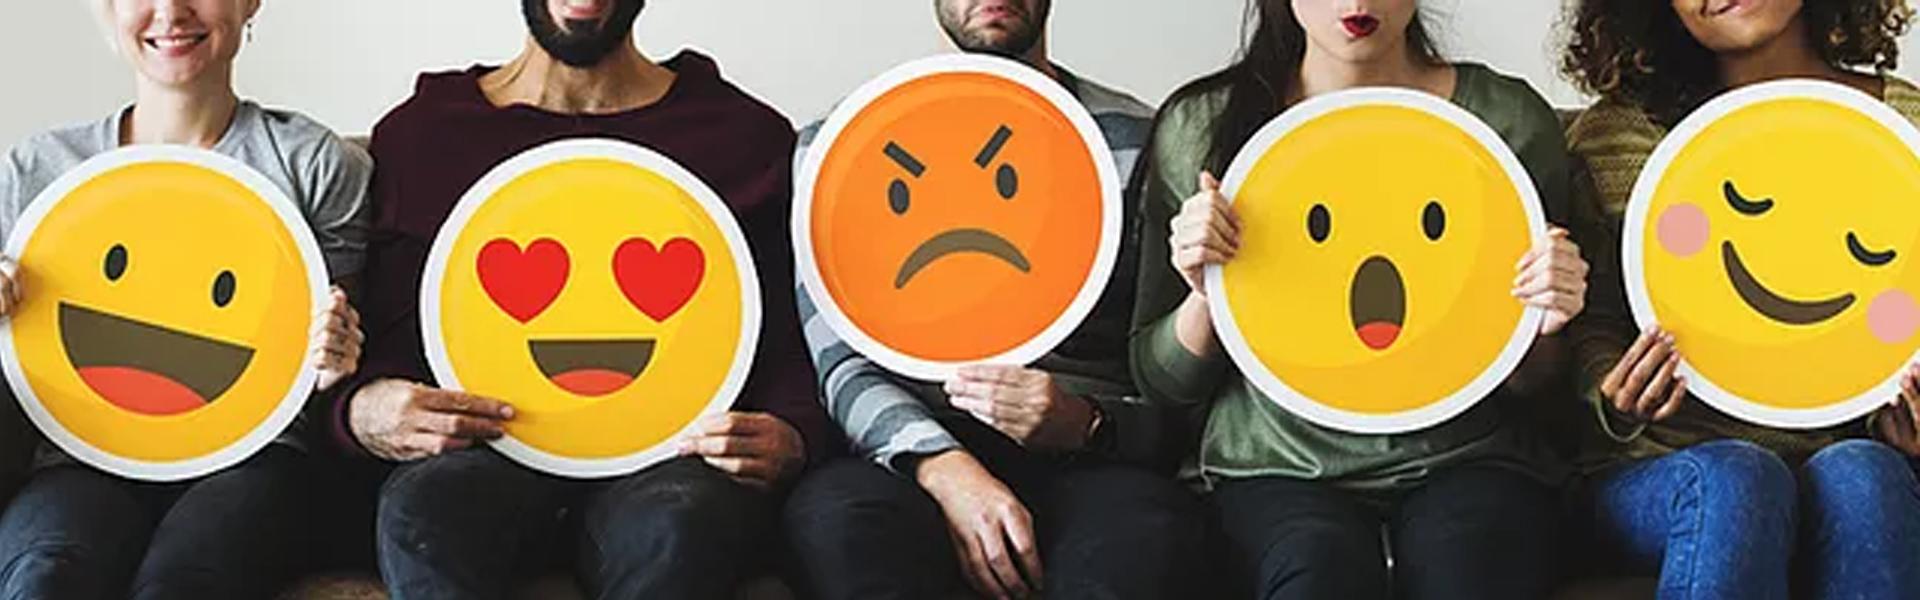 Kundenservice aus Kundensicht. Alles andere als emotionslos.